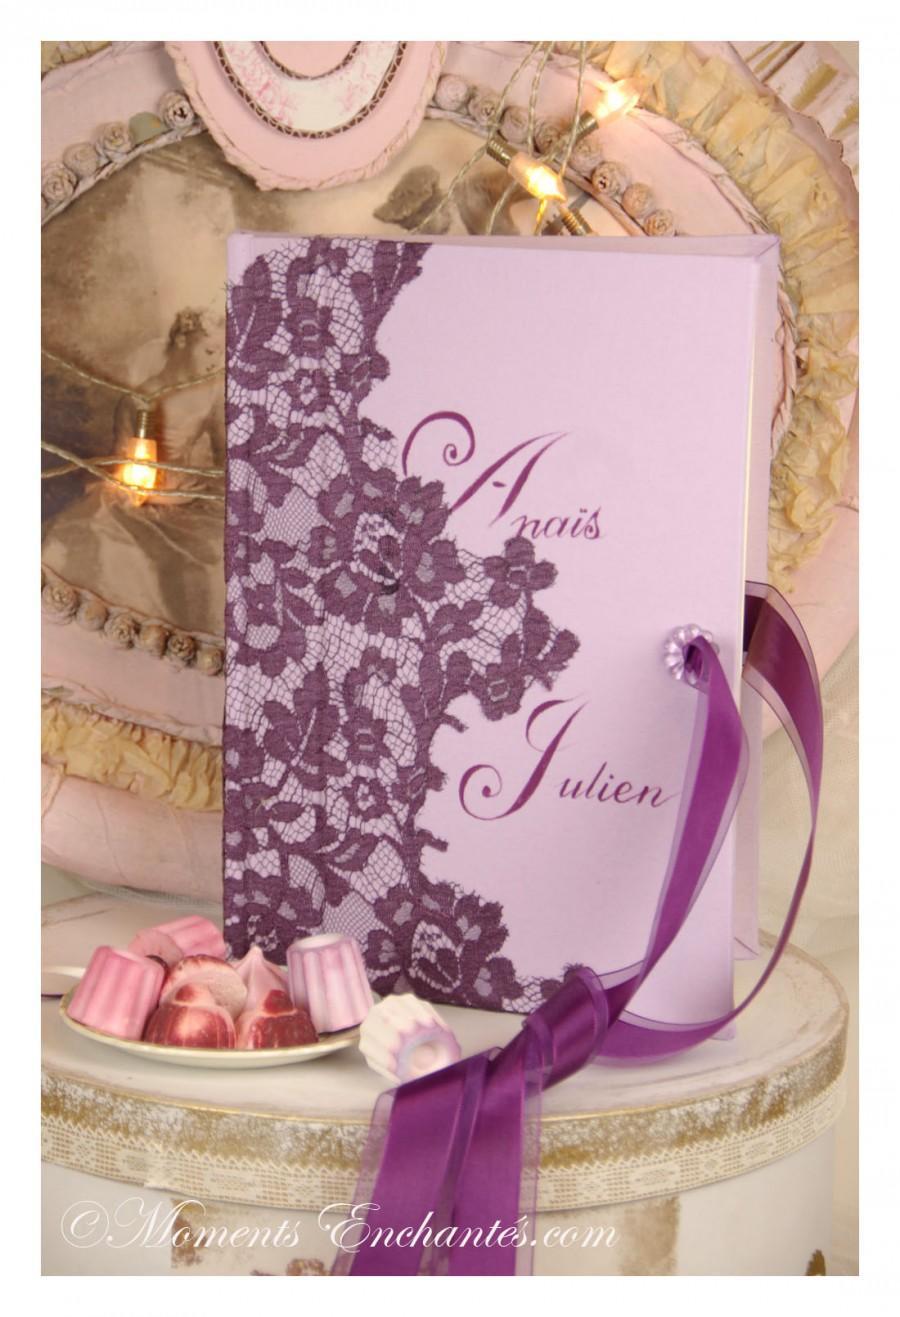 Mariage - Livre d'or mariage dentelle